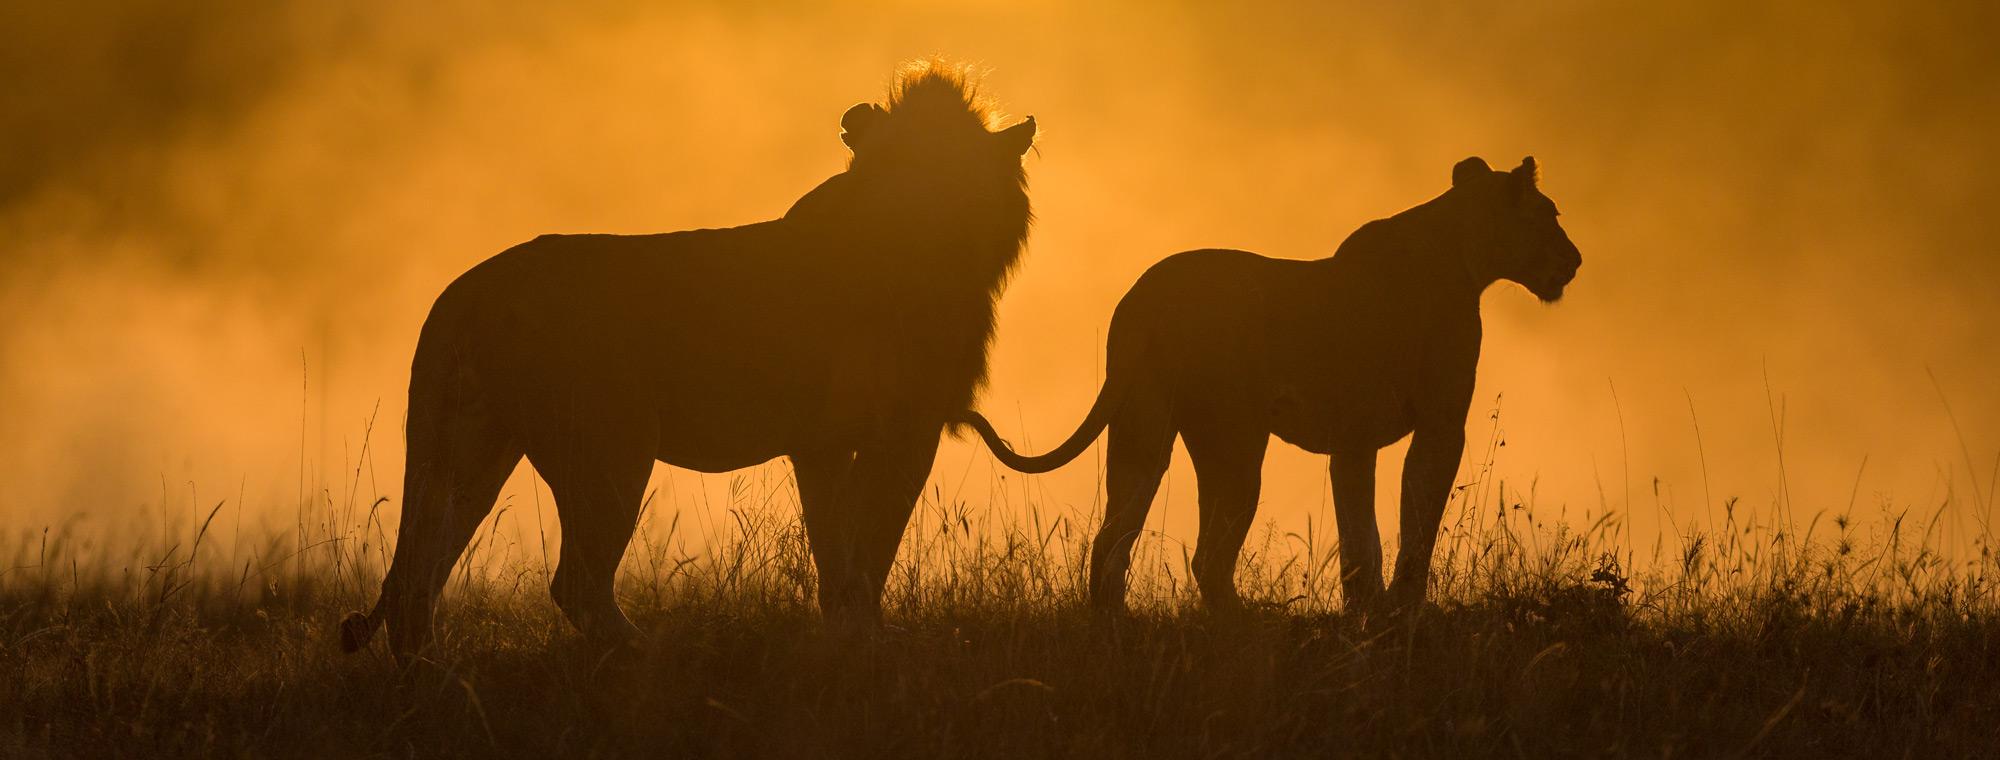 Lions in the mist at sunrise ©Ruzdi Ekenheim